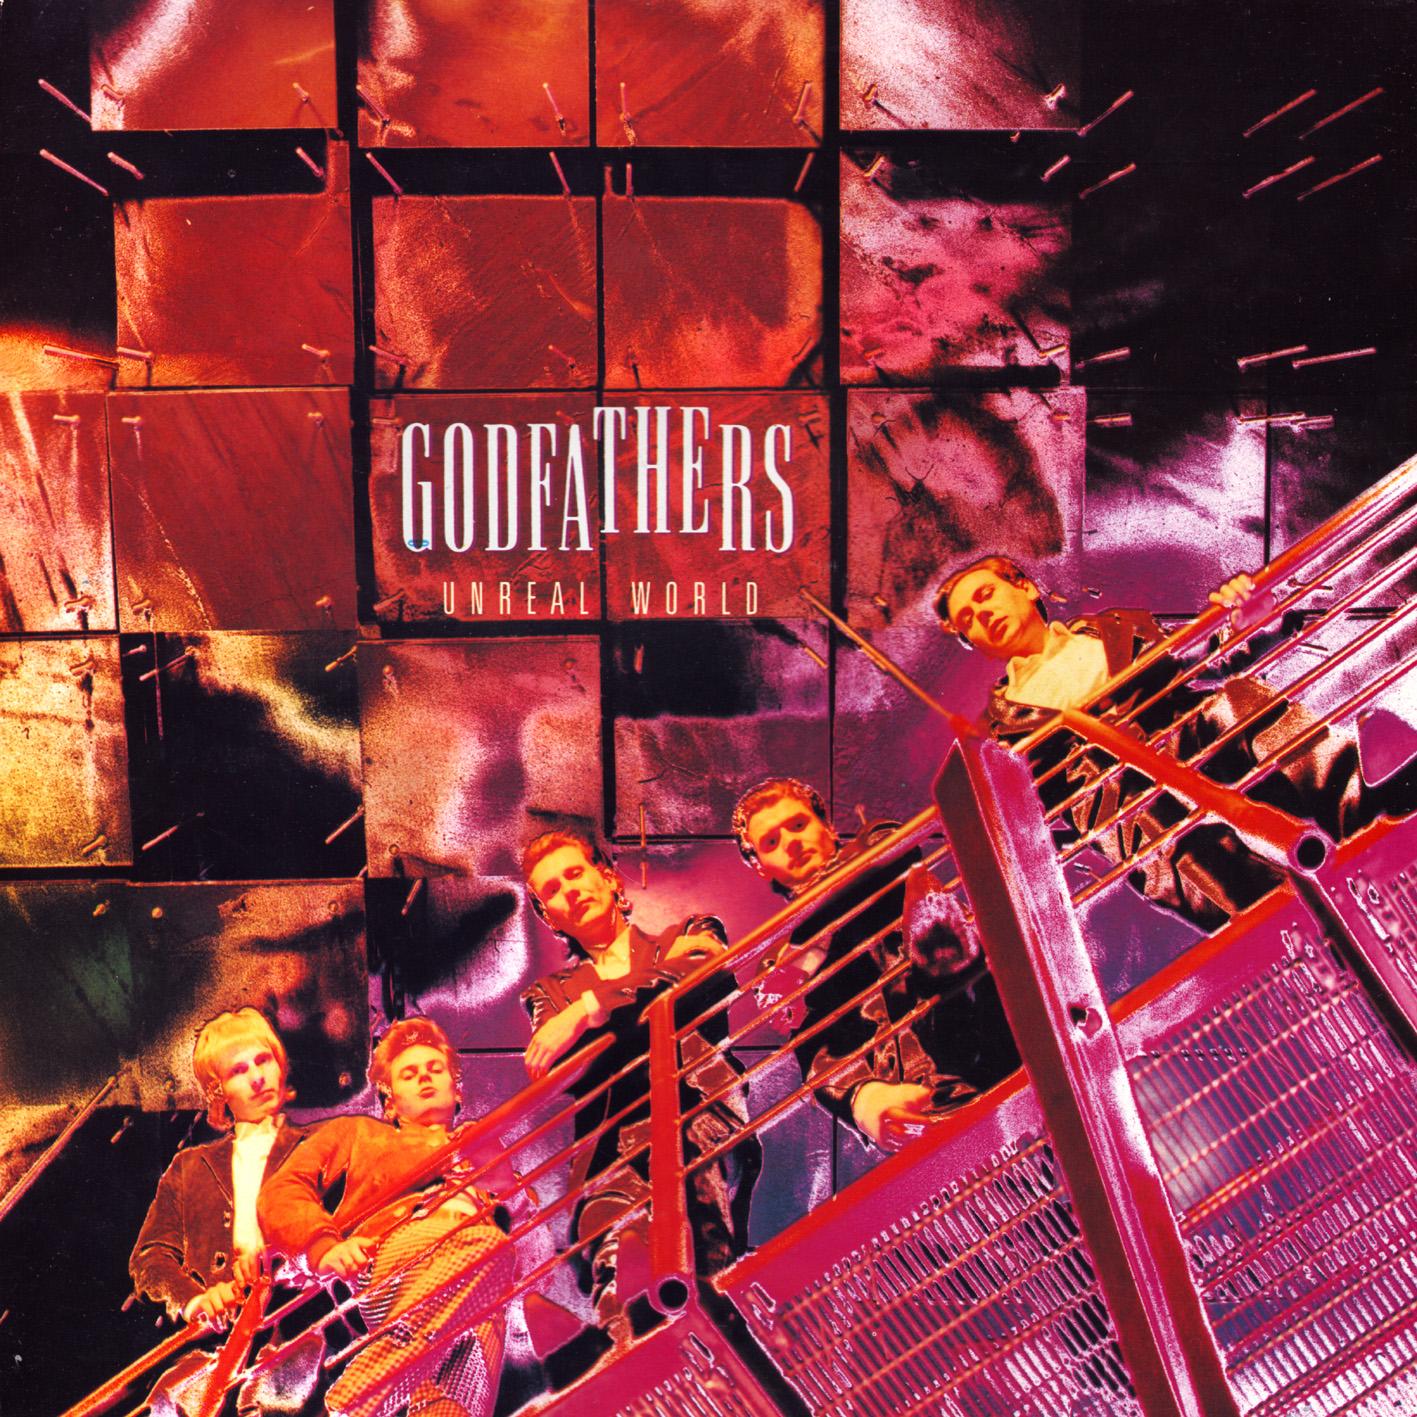 Godfathers - Unreal World